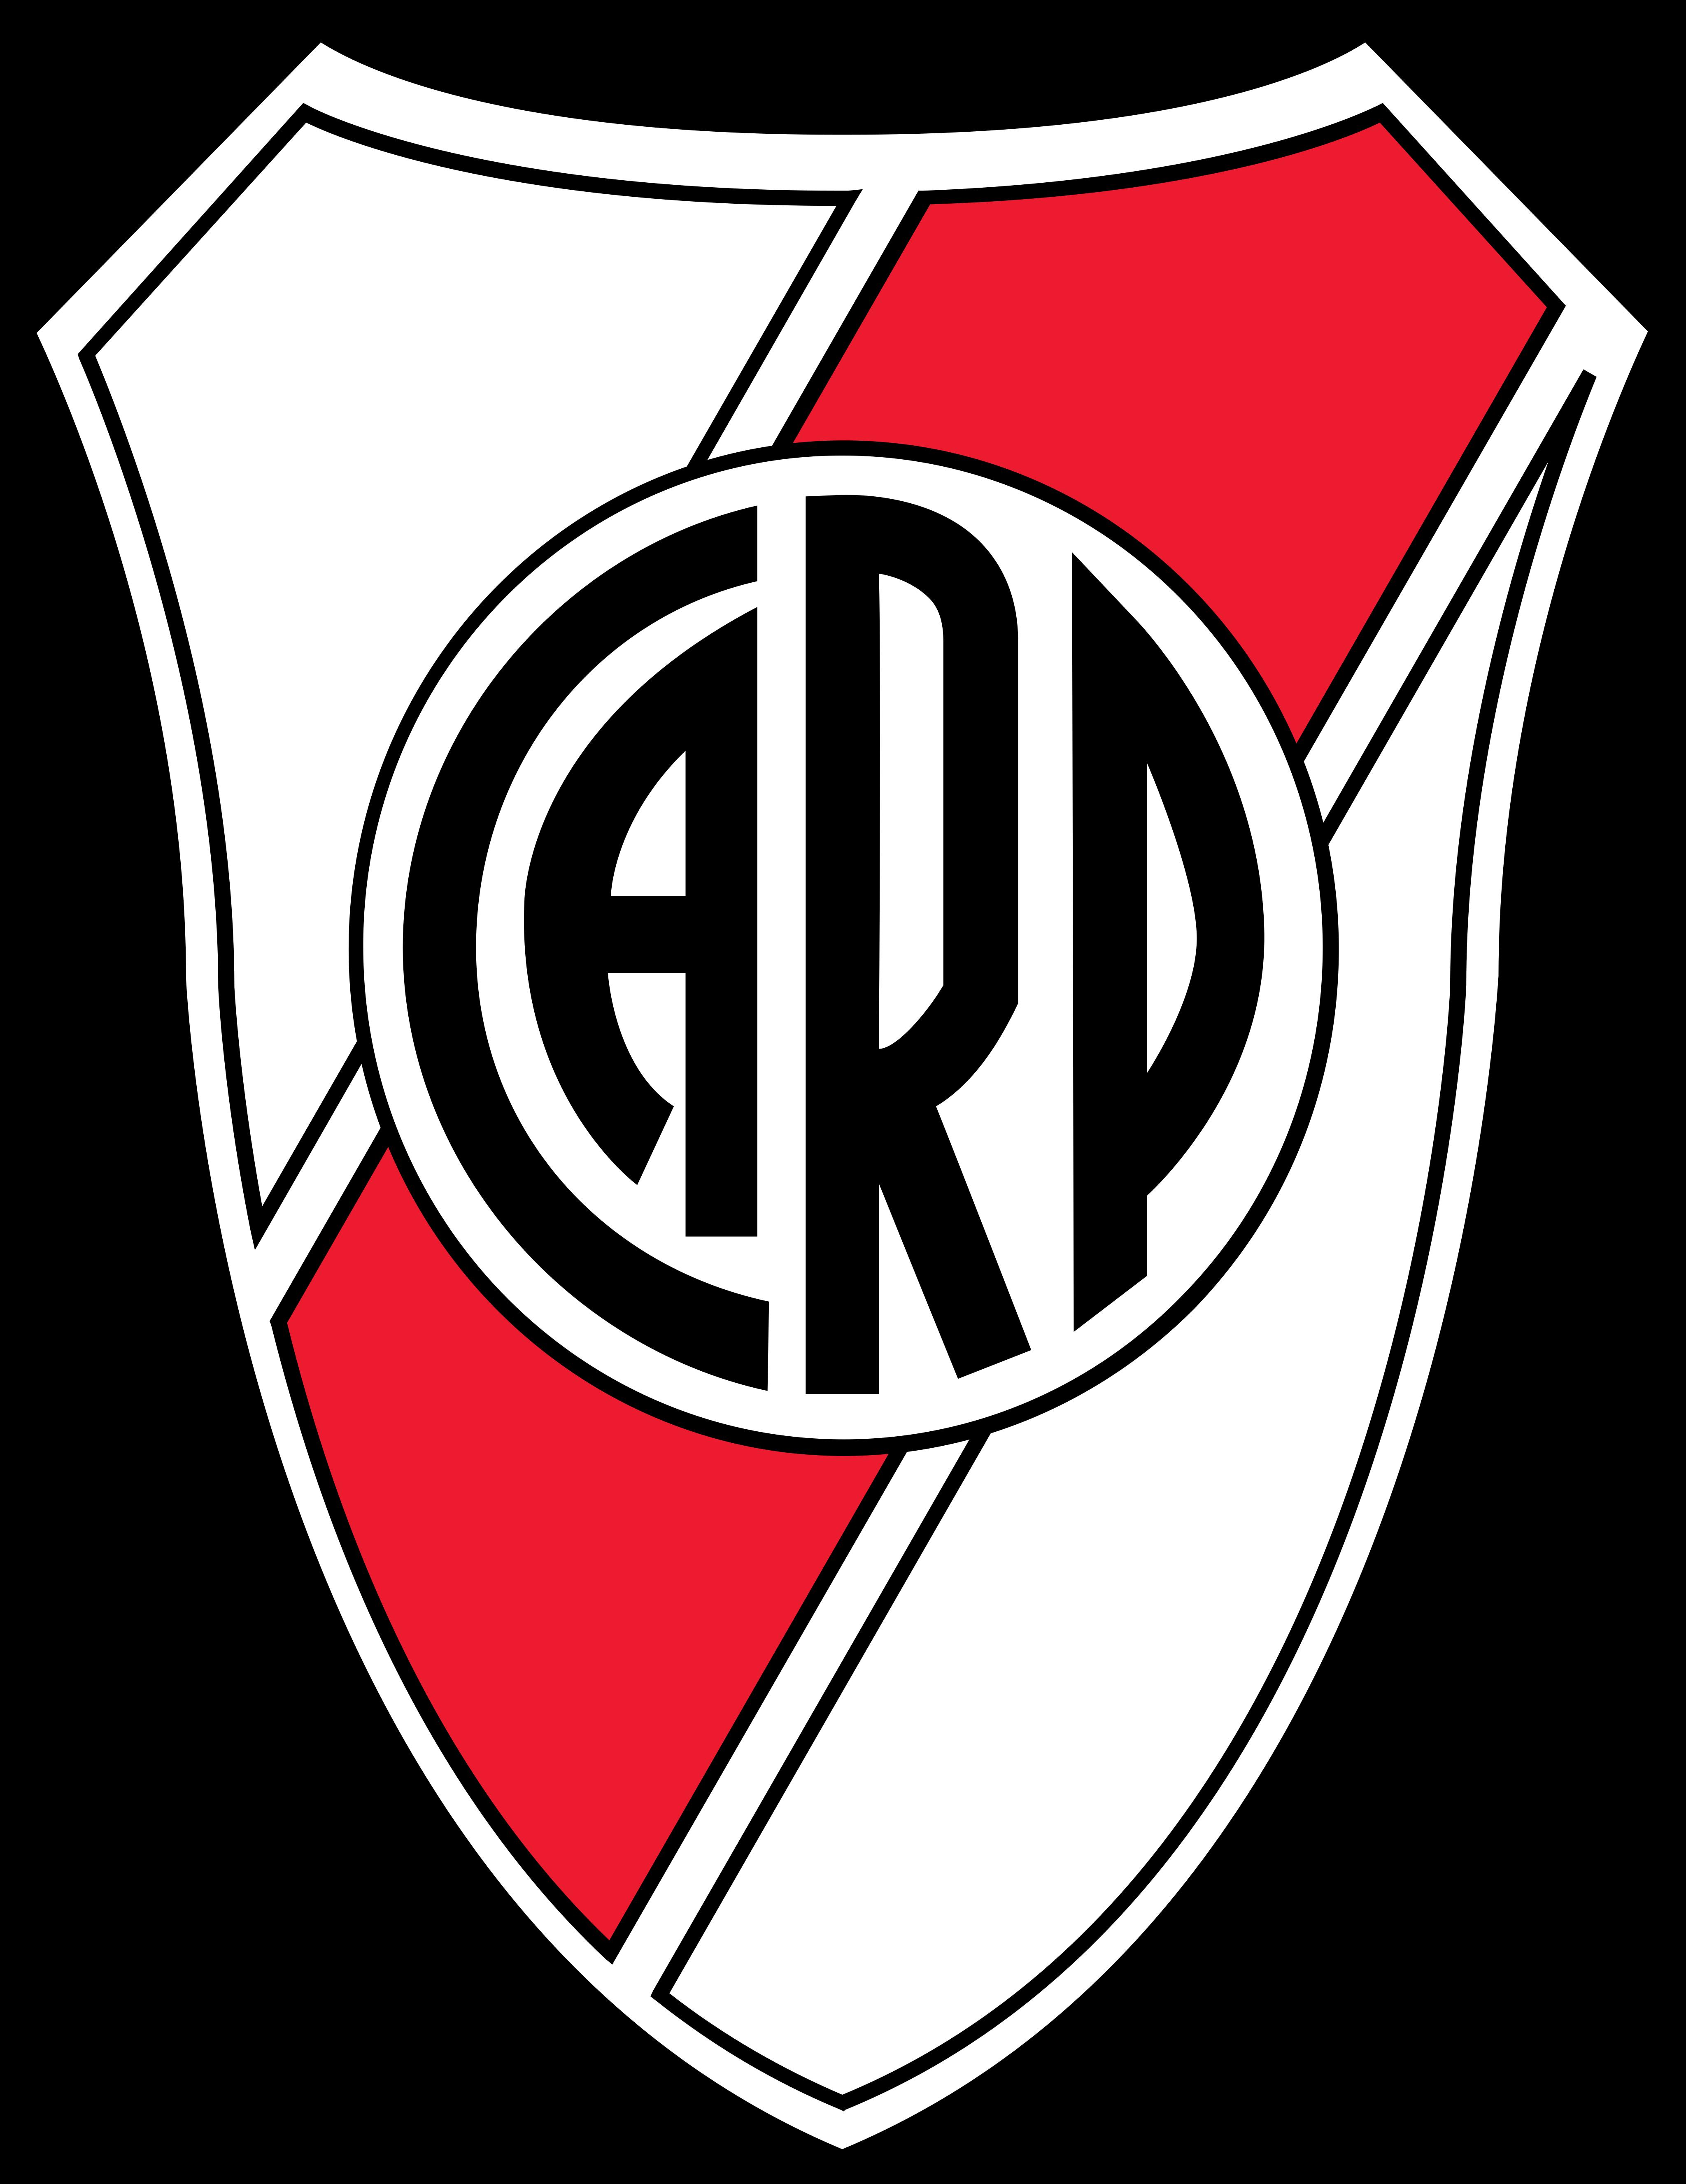 river plate logo 5 - River Plate Logo